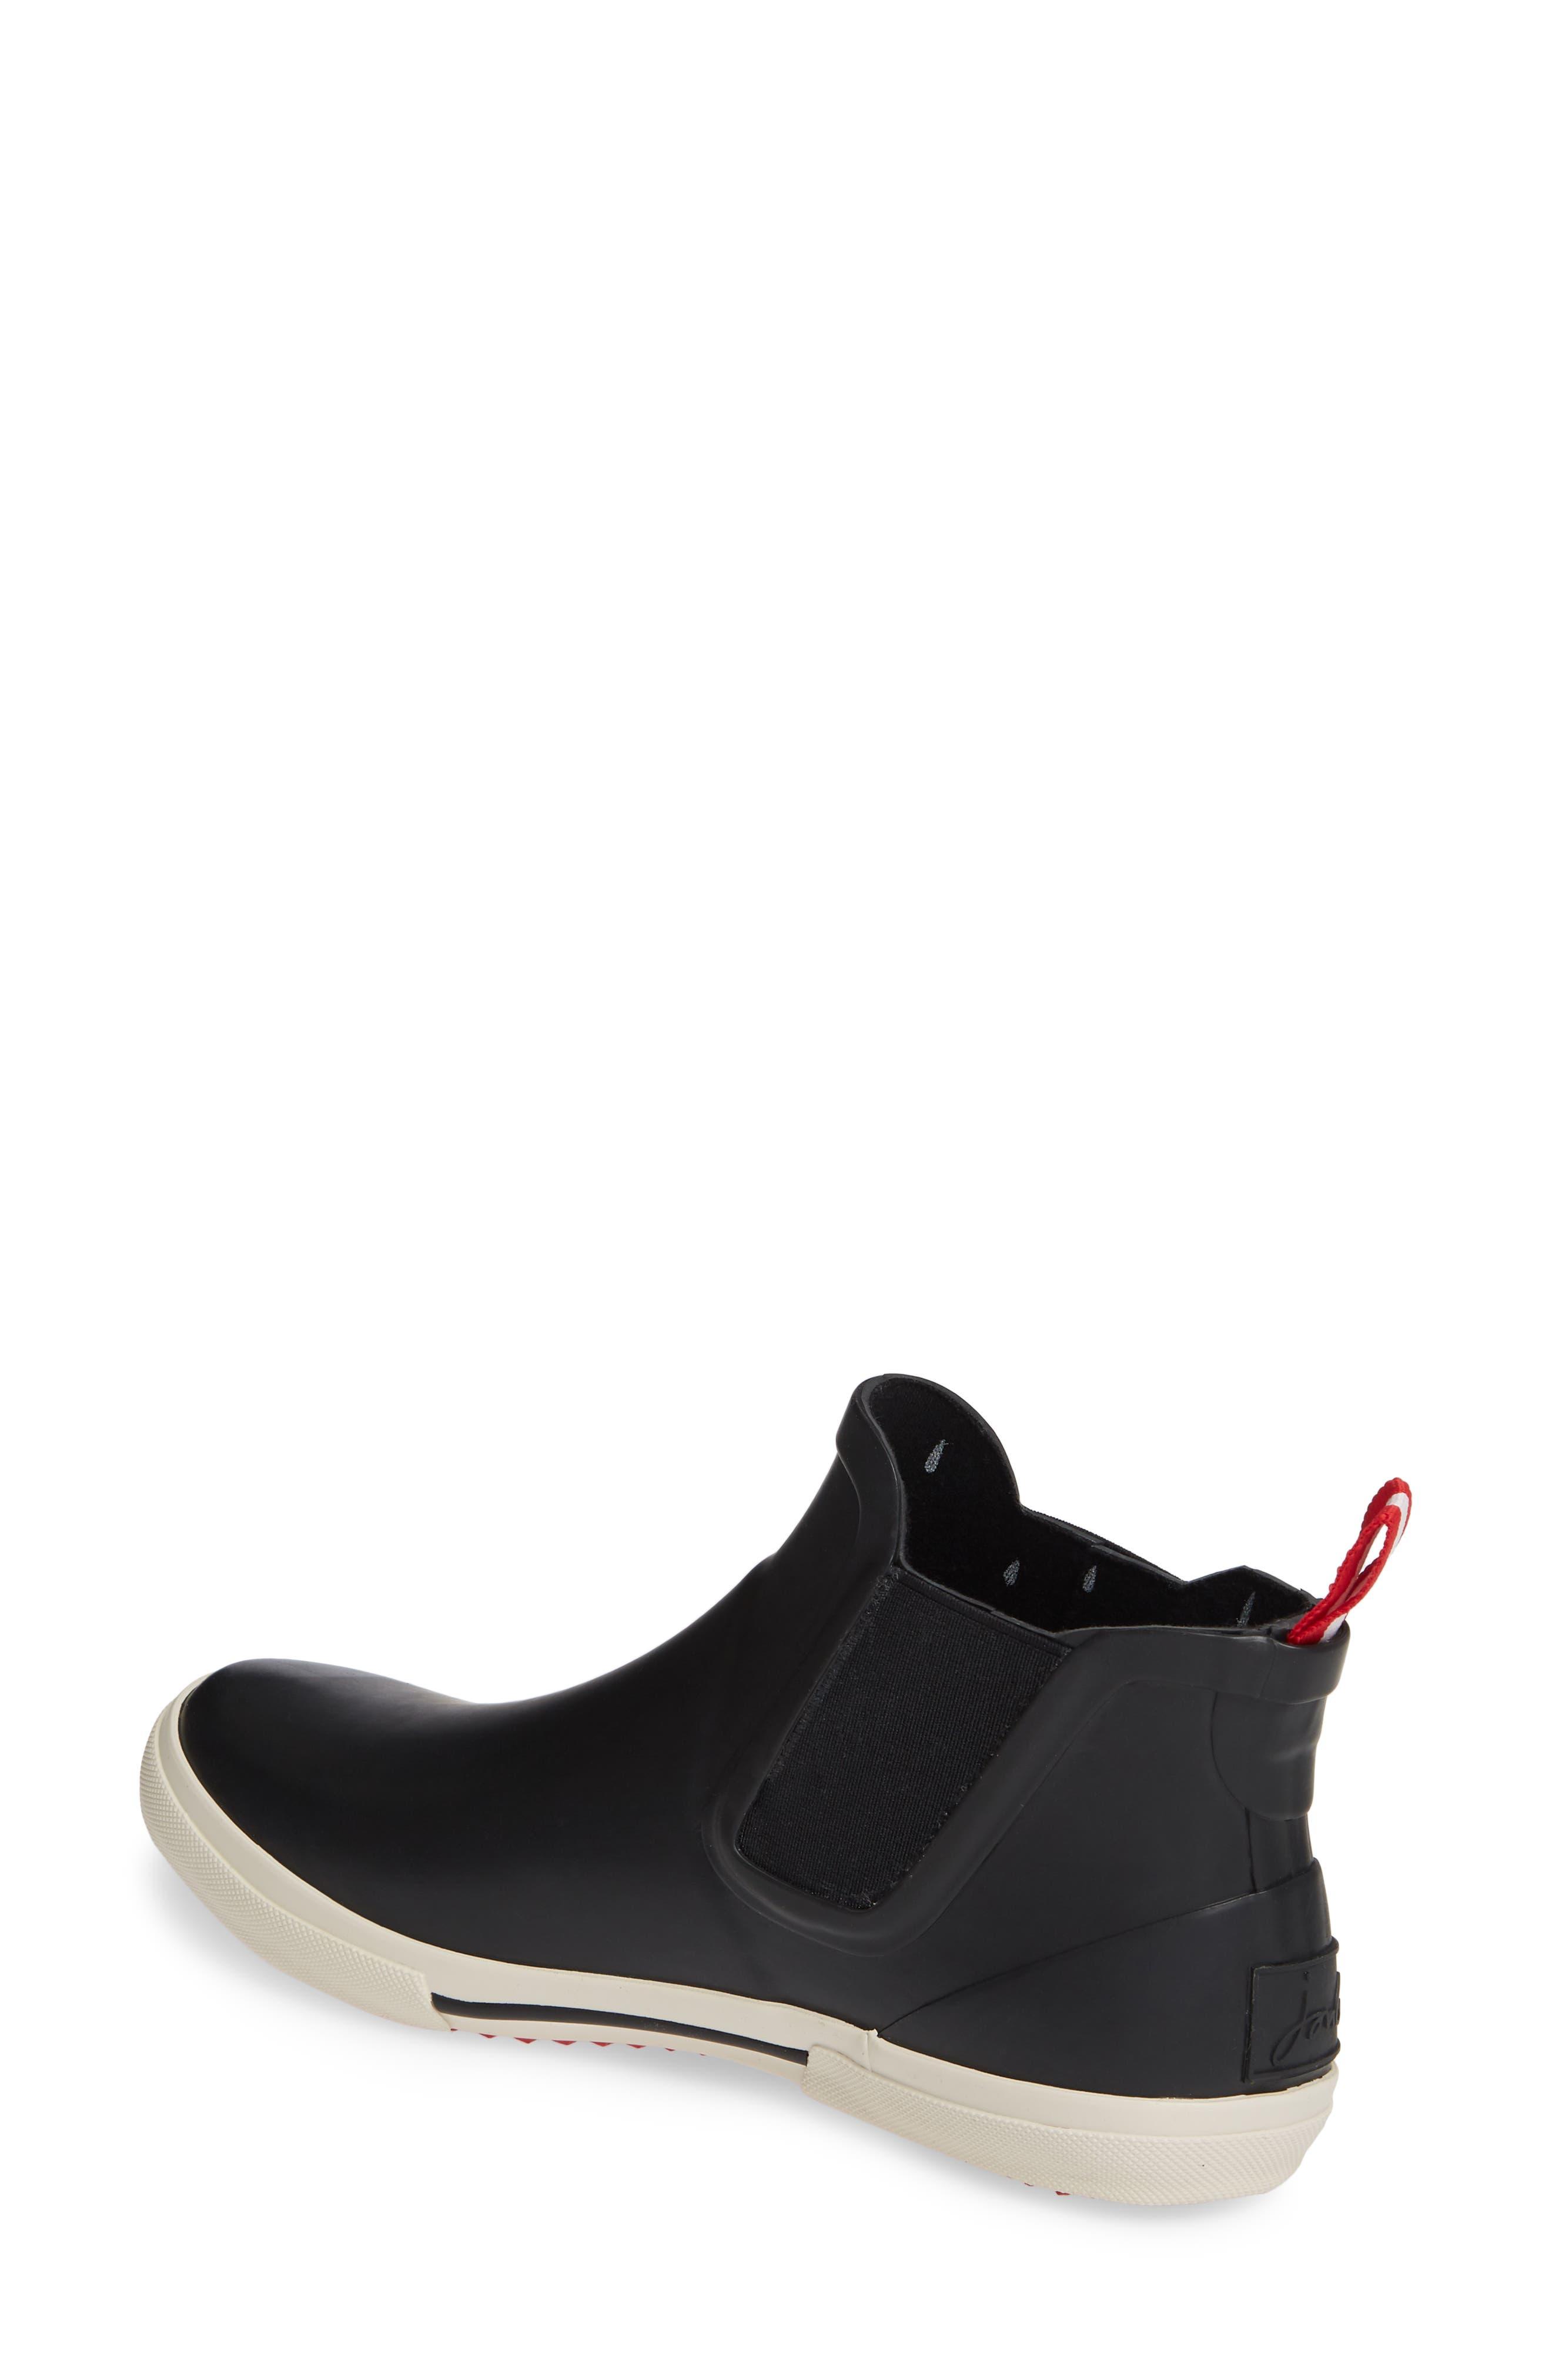 JOULES, Rainwell Waterproof Chelsea Rain Boot, Alternate thumbnail 2, color, BLACK